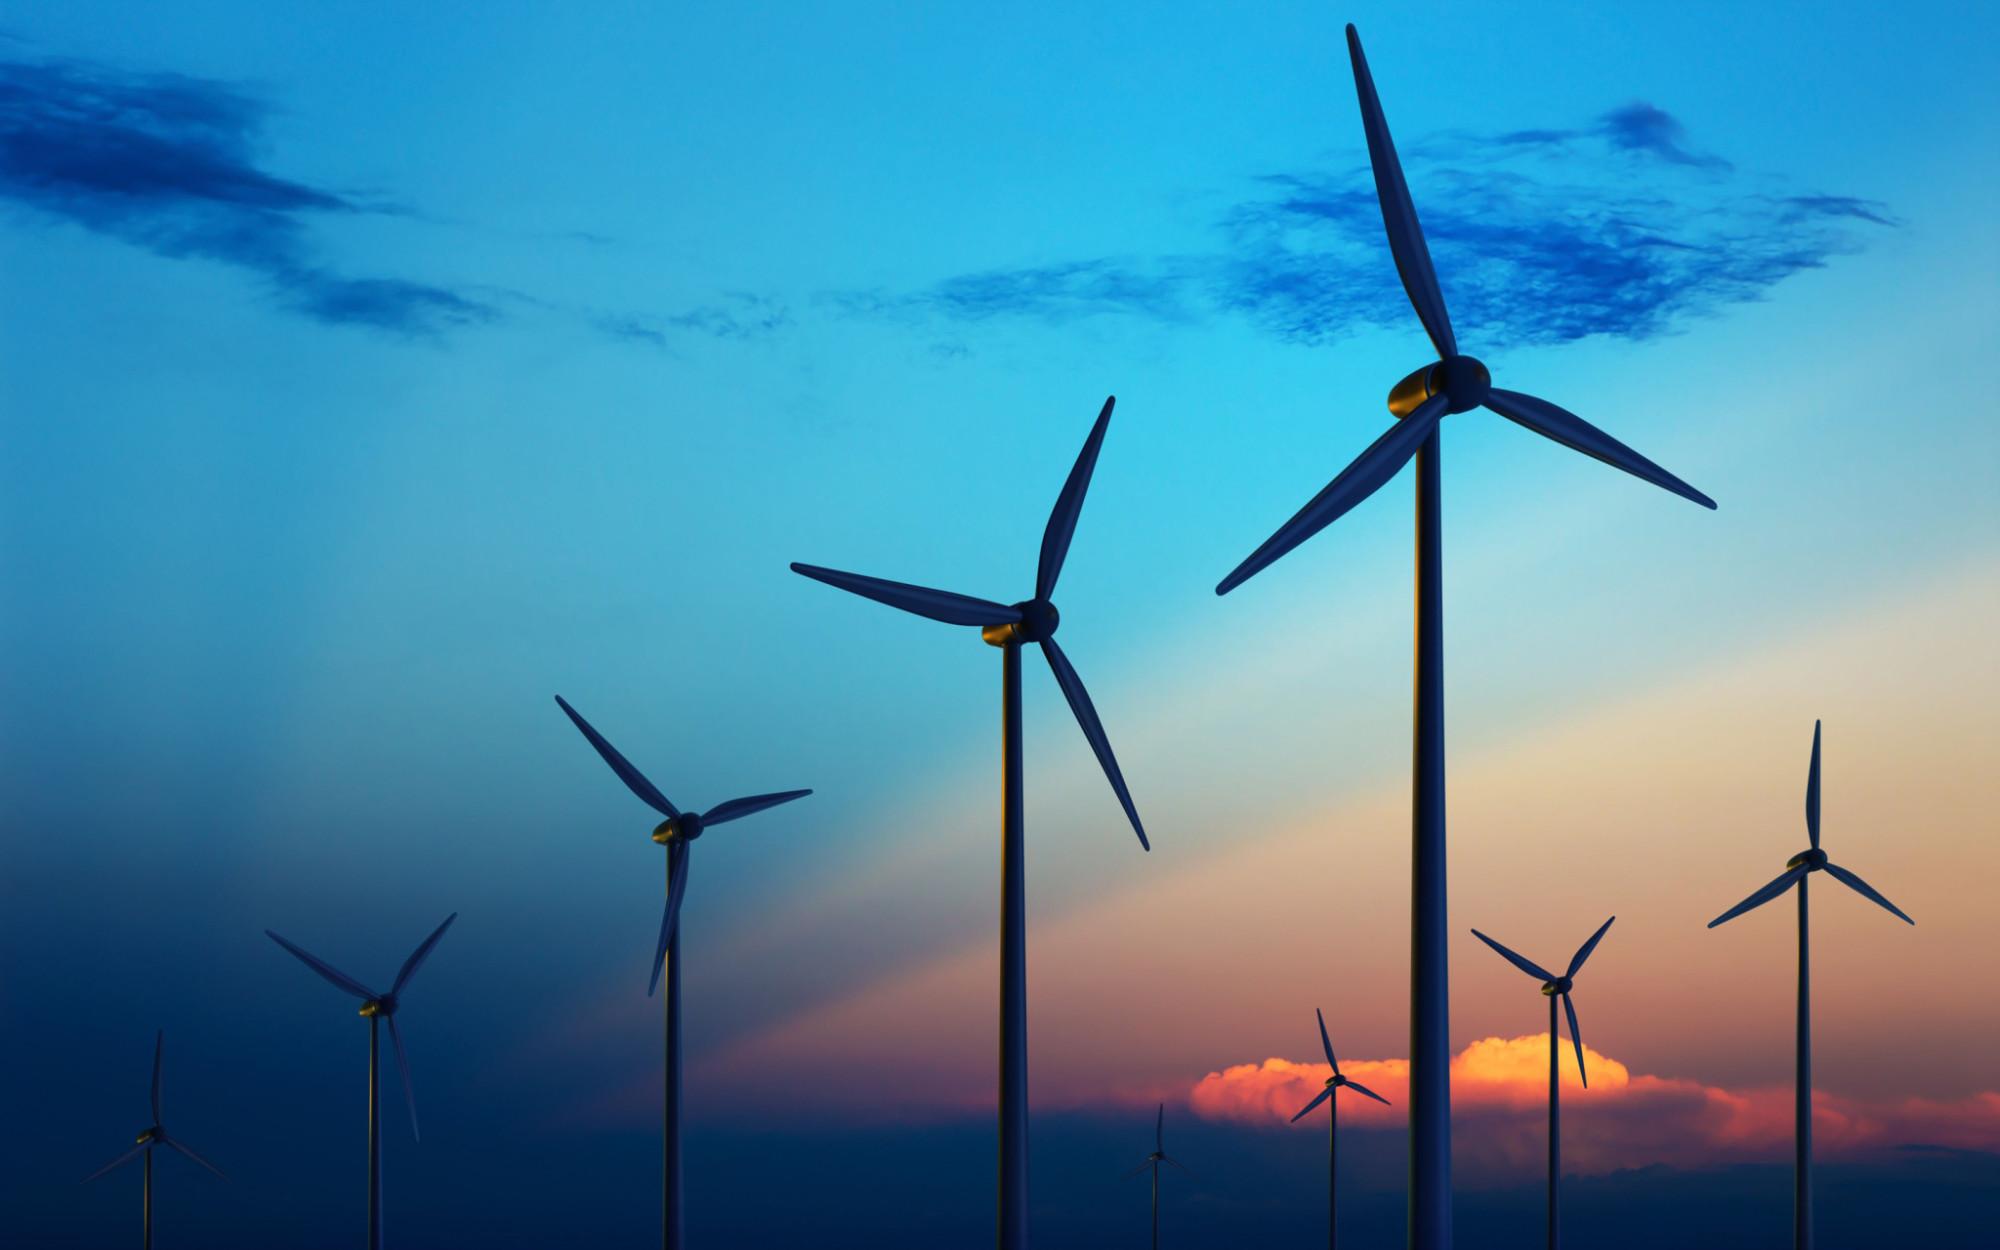 landscape-beautiful-wind-turbines-wallpaper_s5sxdc